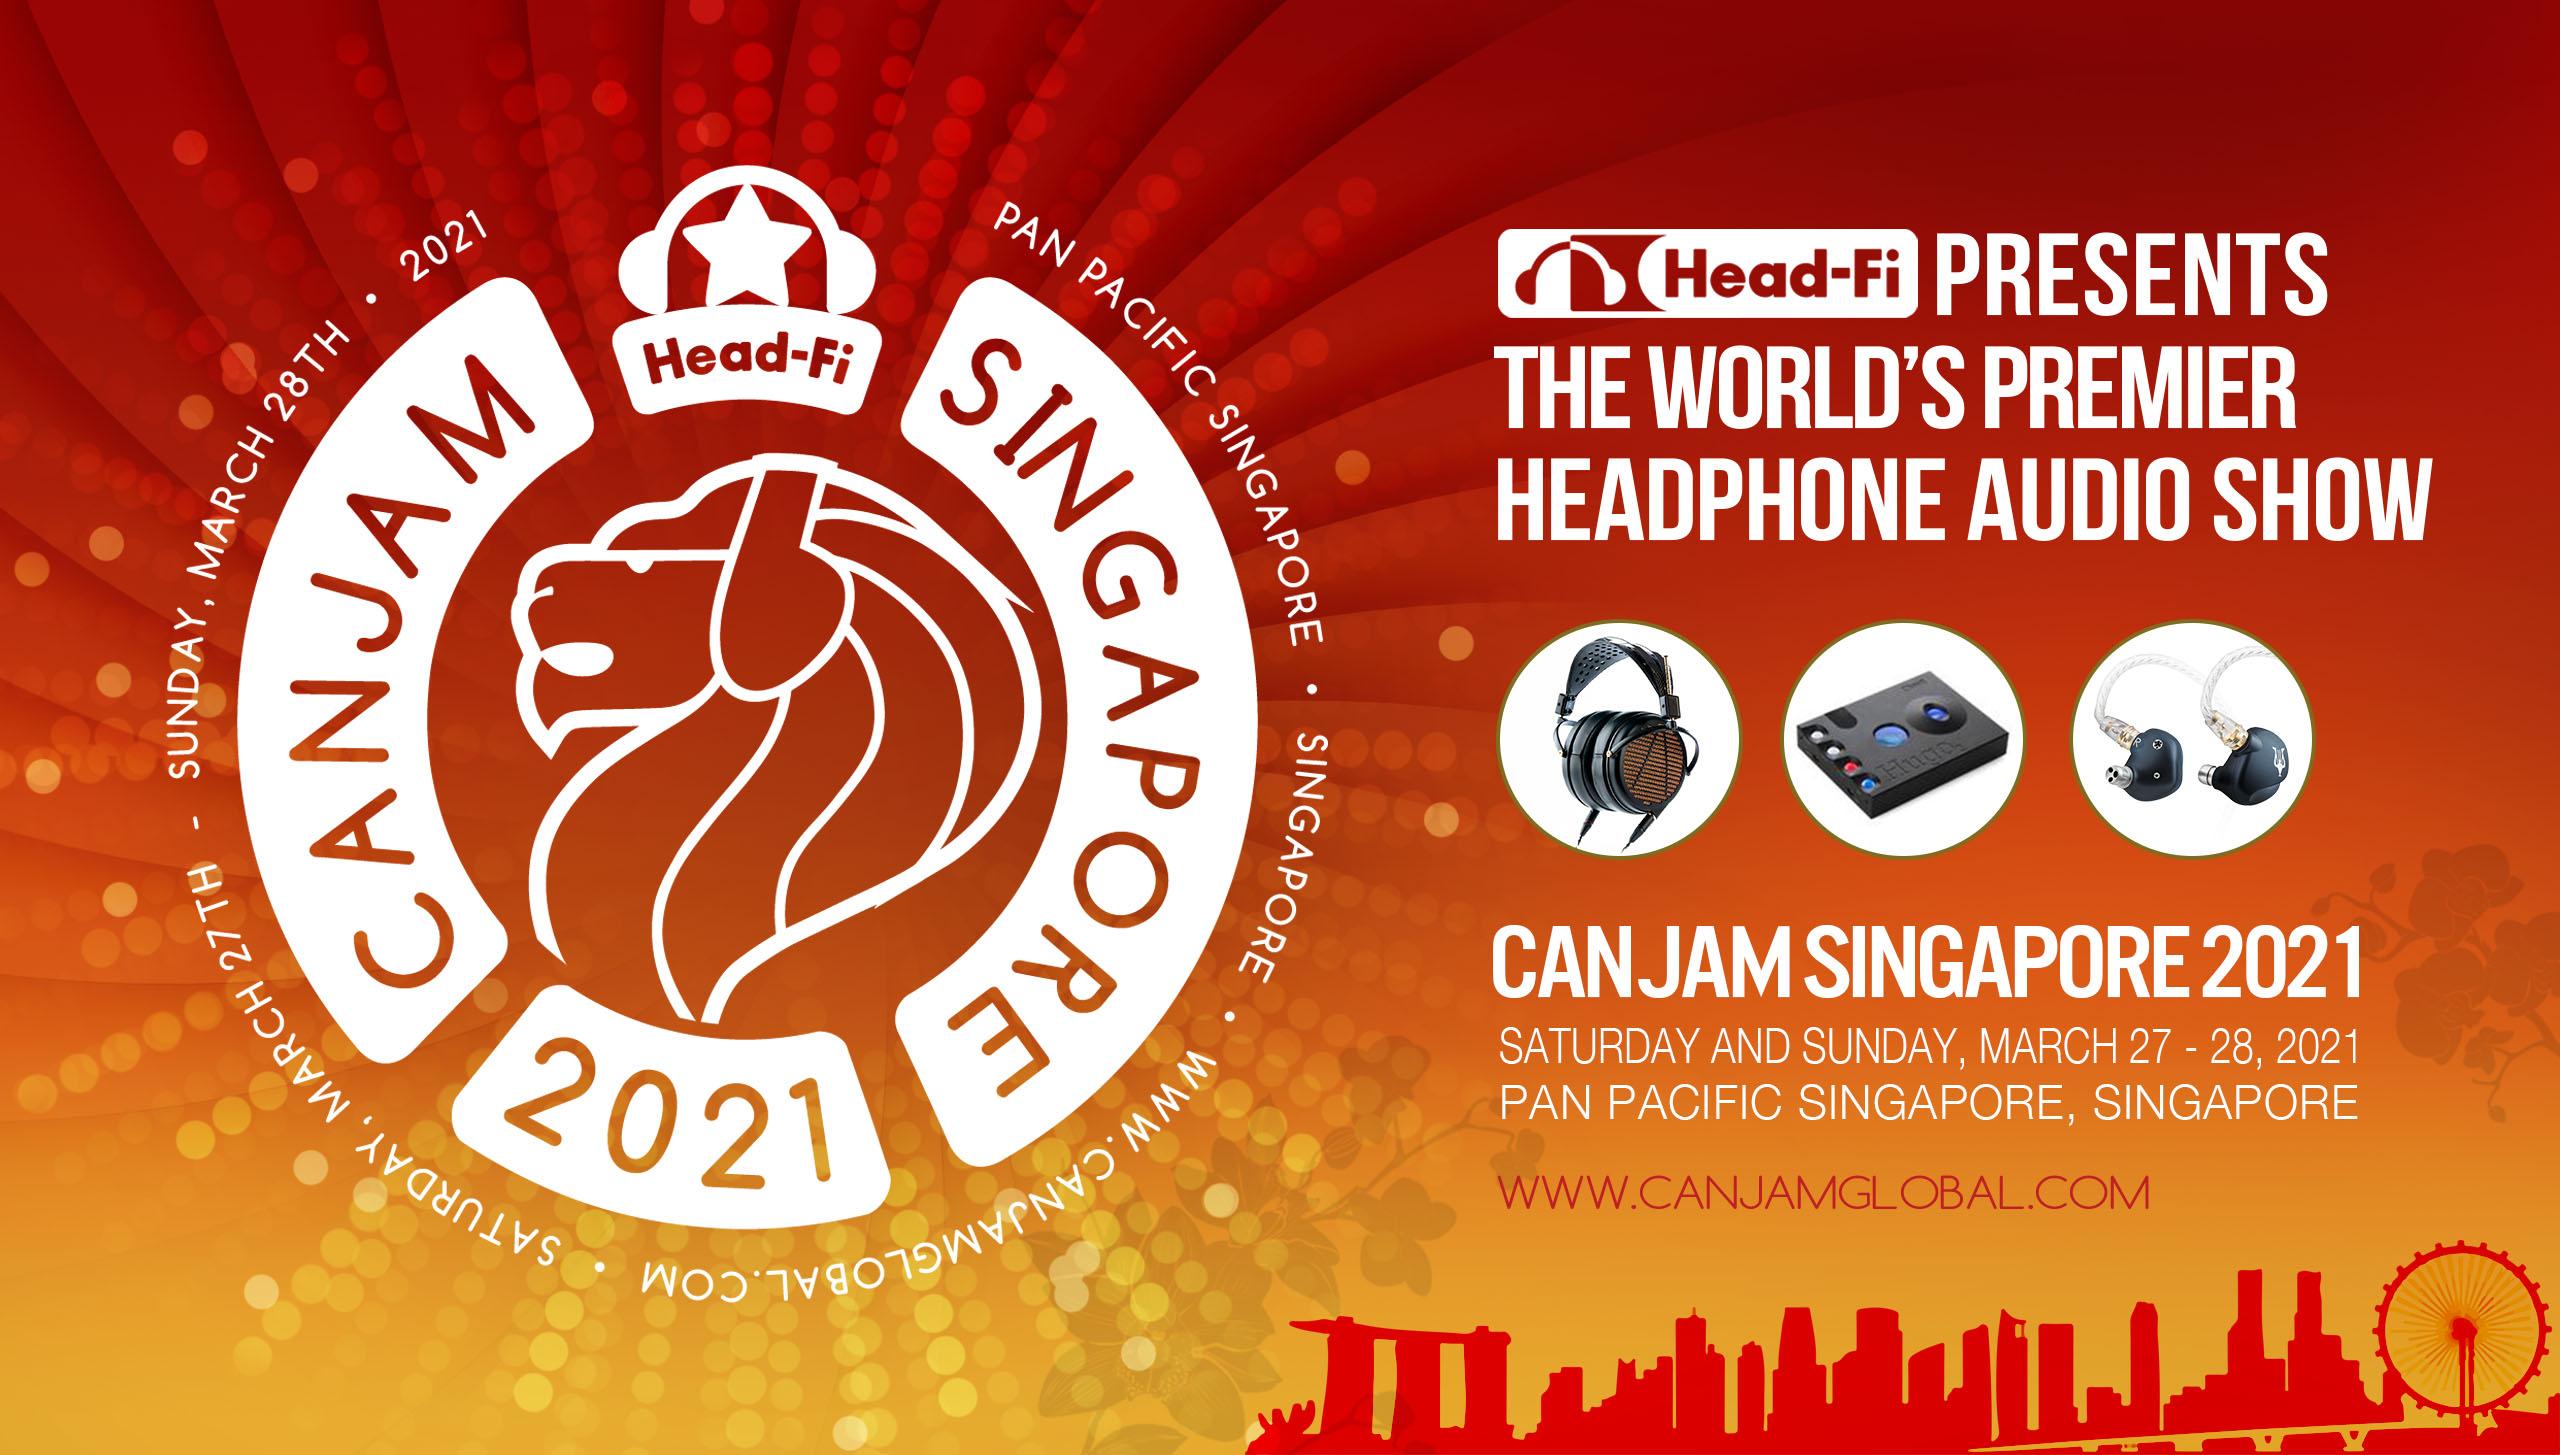 Singapore big banner (2).jpg